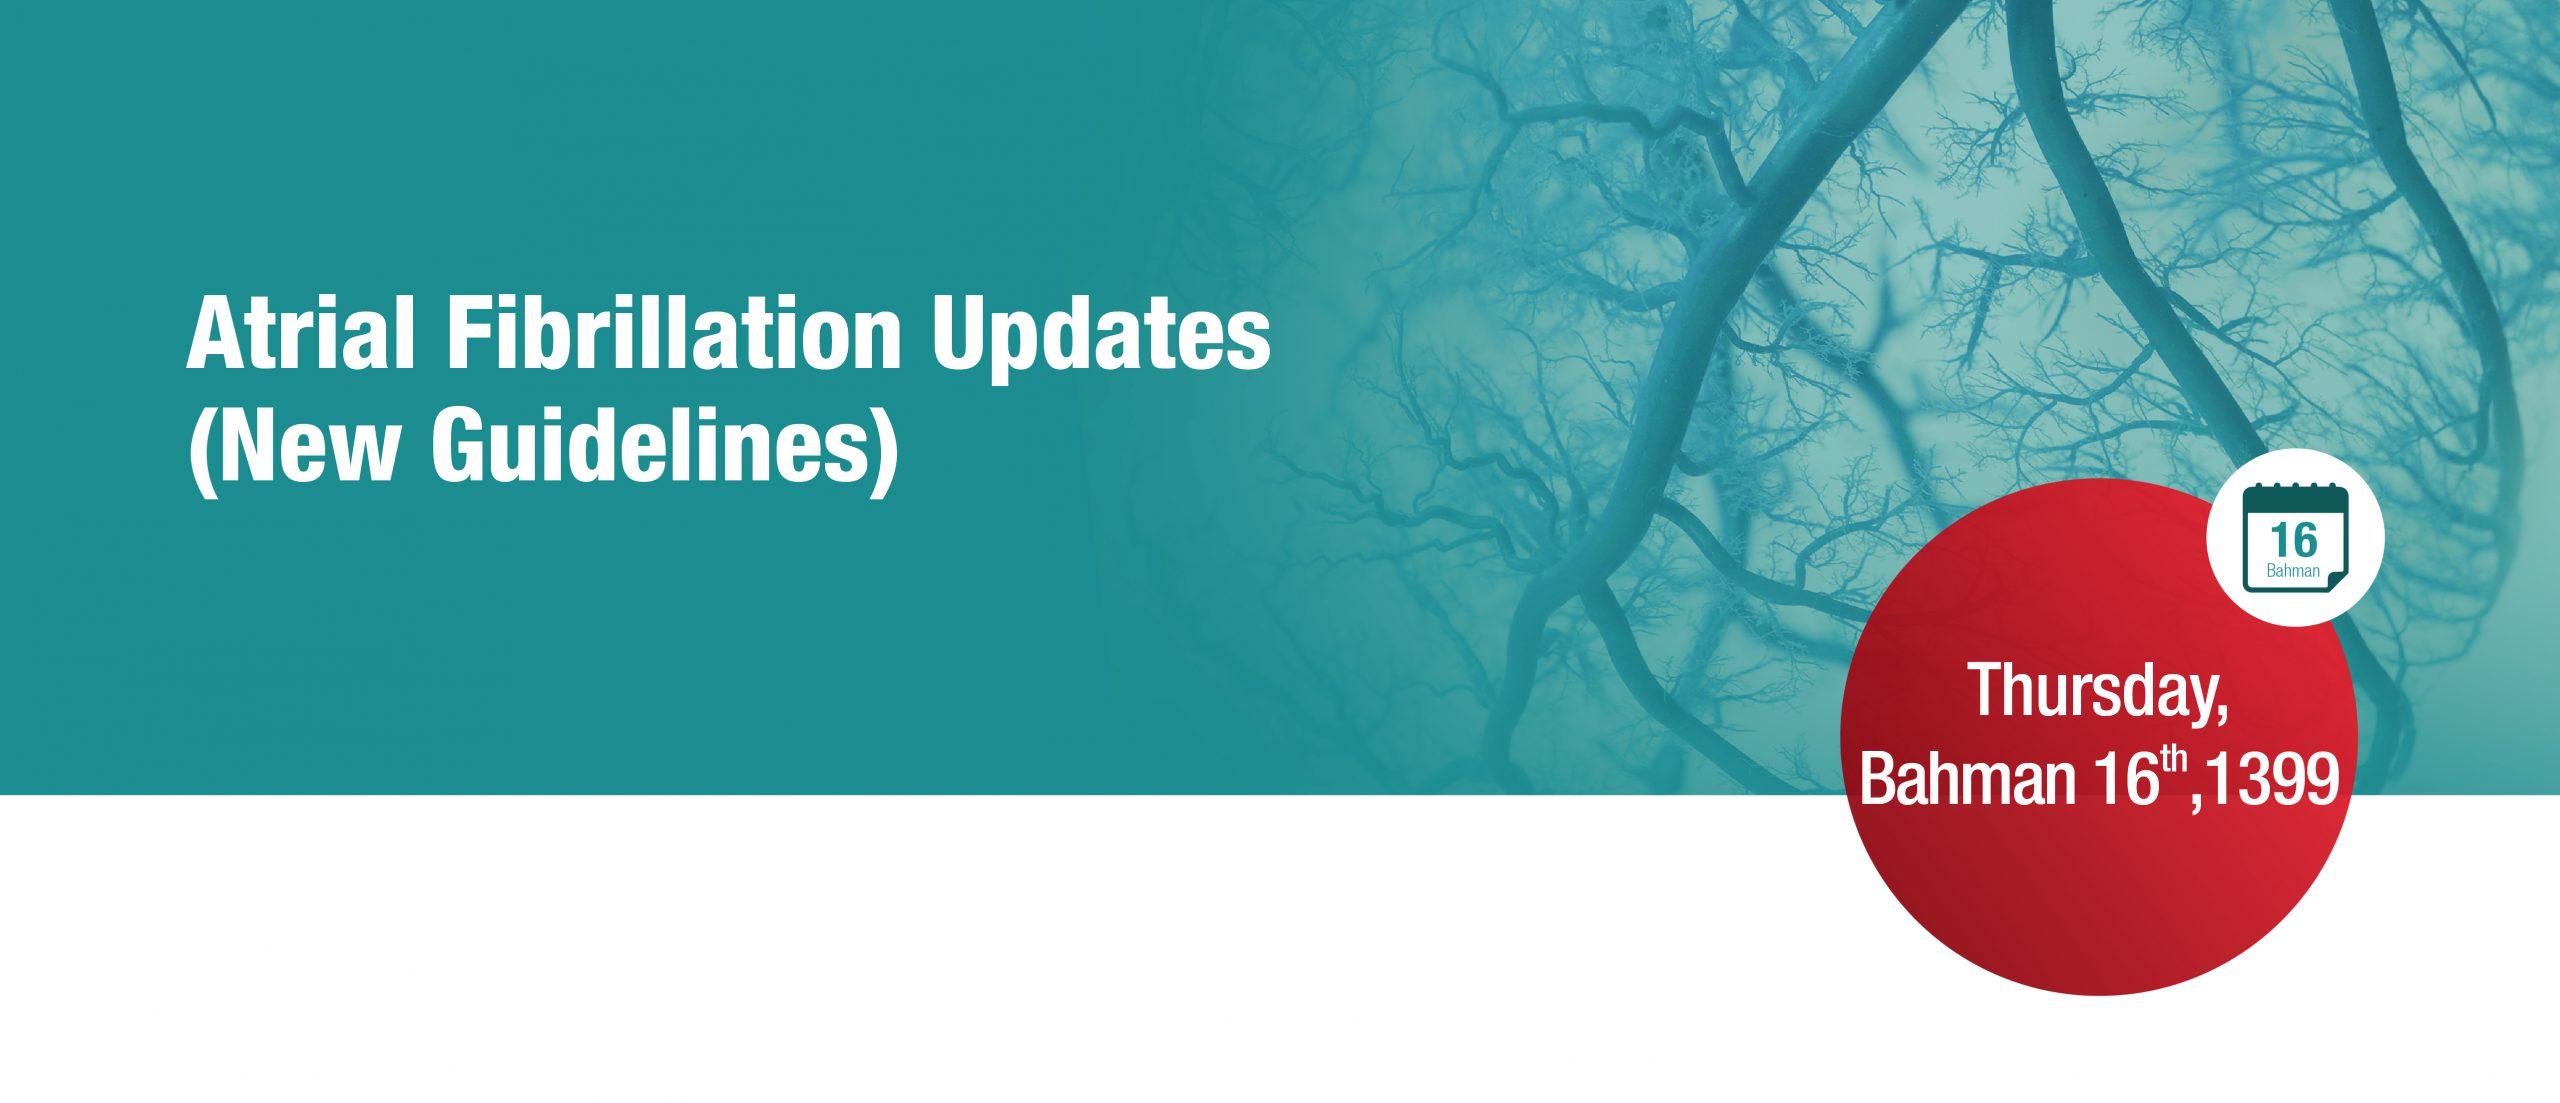 Atrial Fibrillation Updates (New Guidelines)